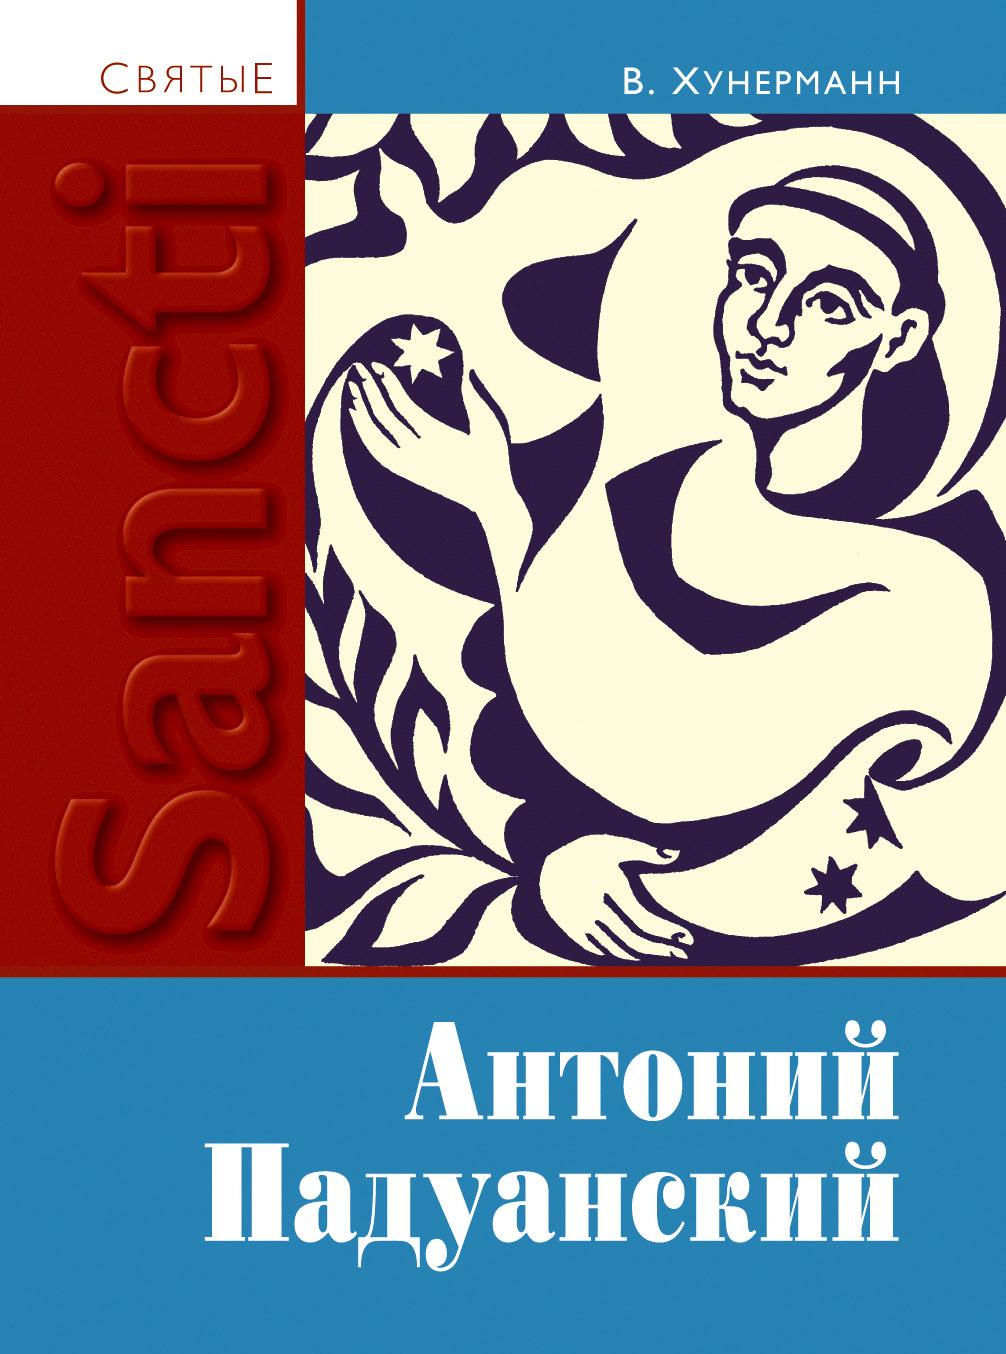 Вильгельм Хунерман Святой Антоний Падуанский алексей петрович бородкин святой антоний